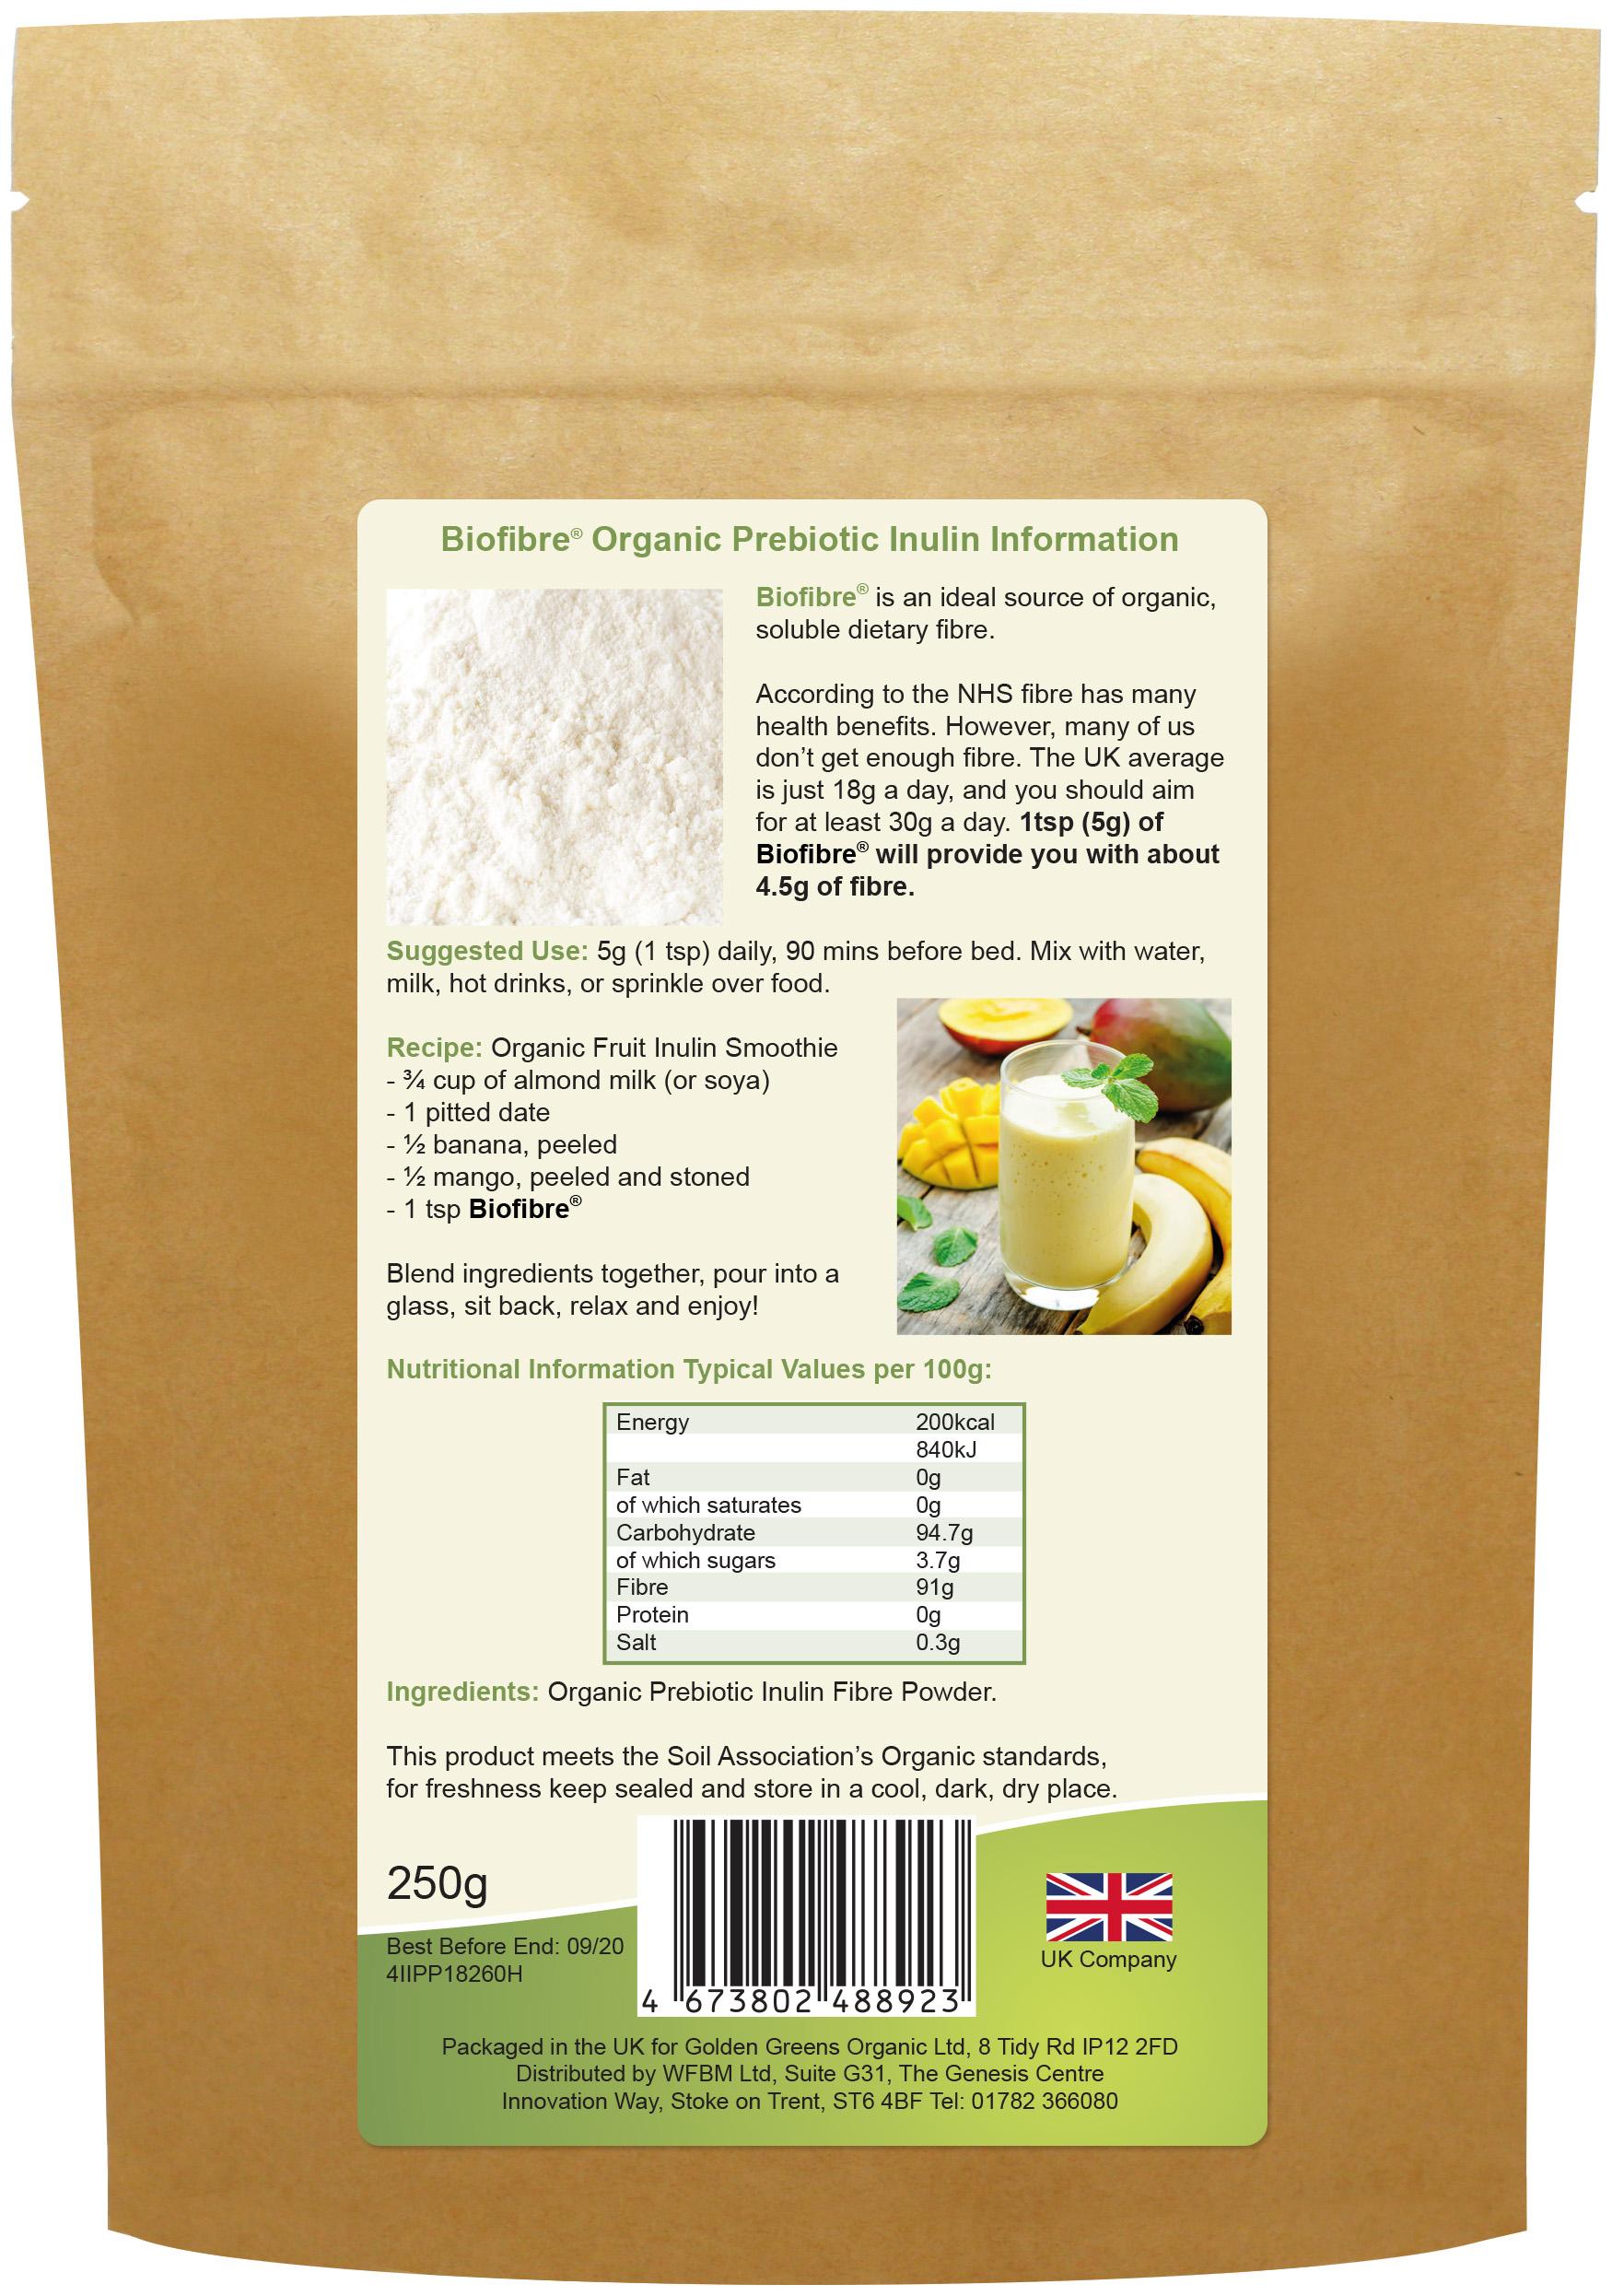 Biofibre Organic Prebiotic Inulin 250g